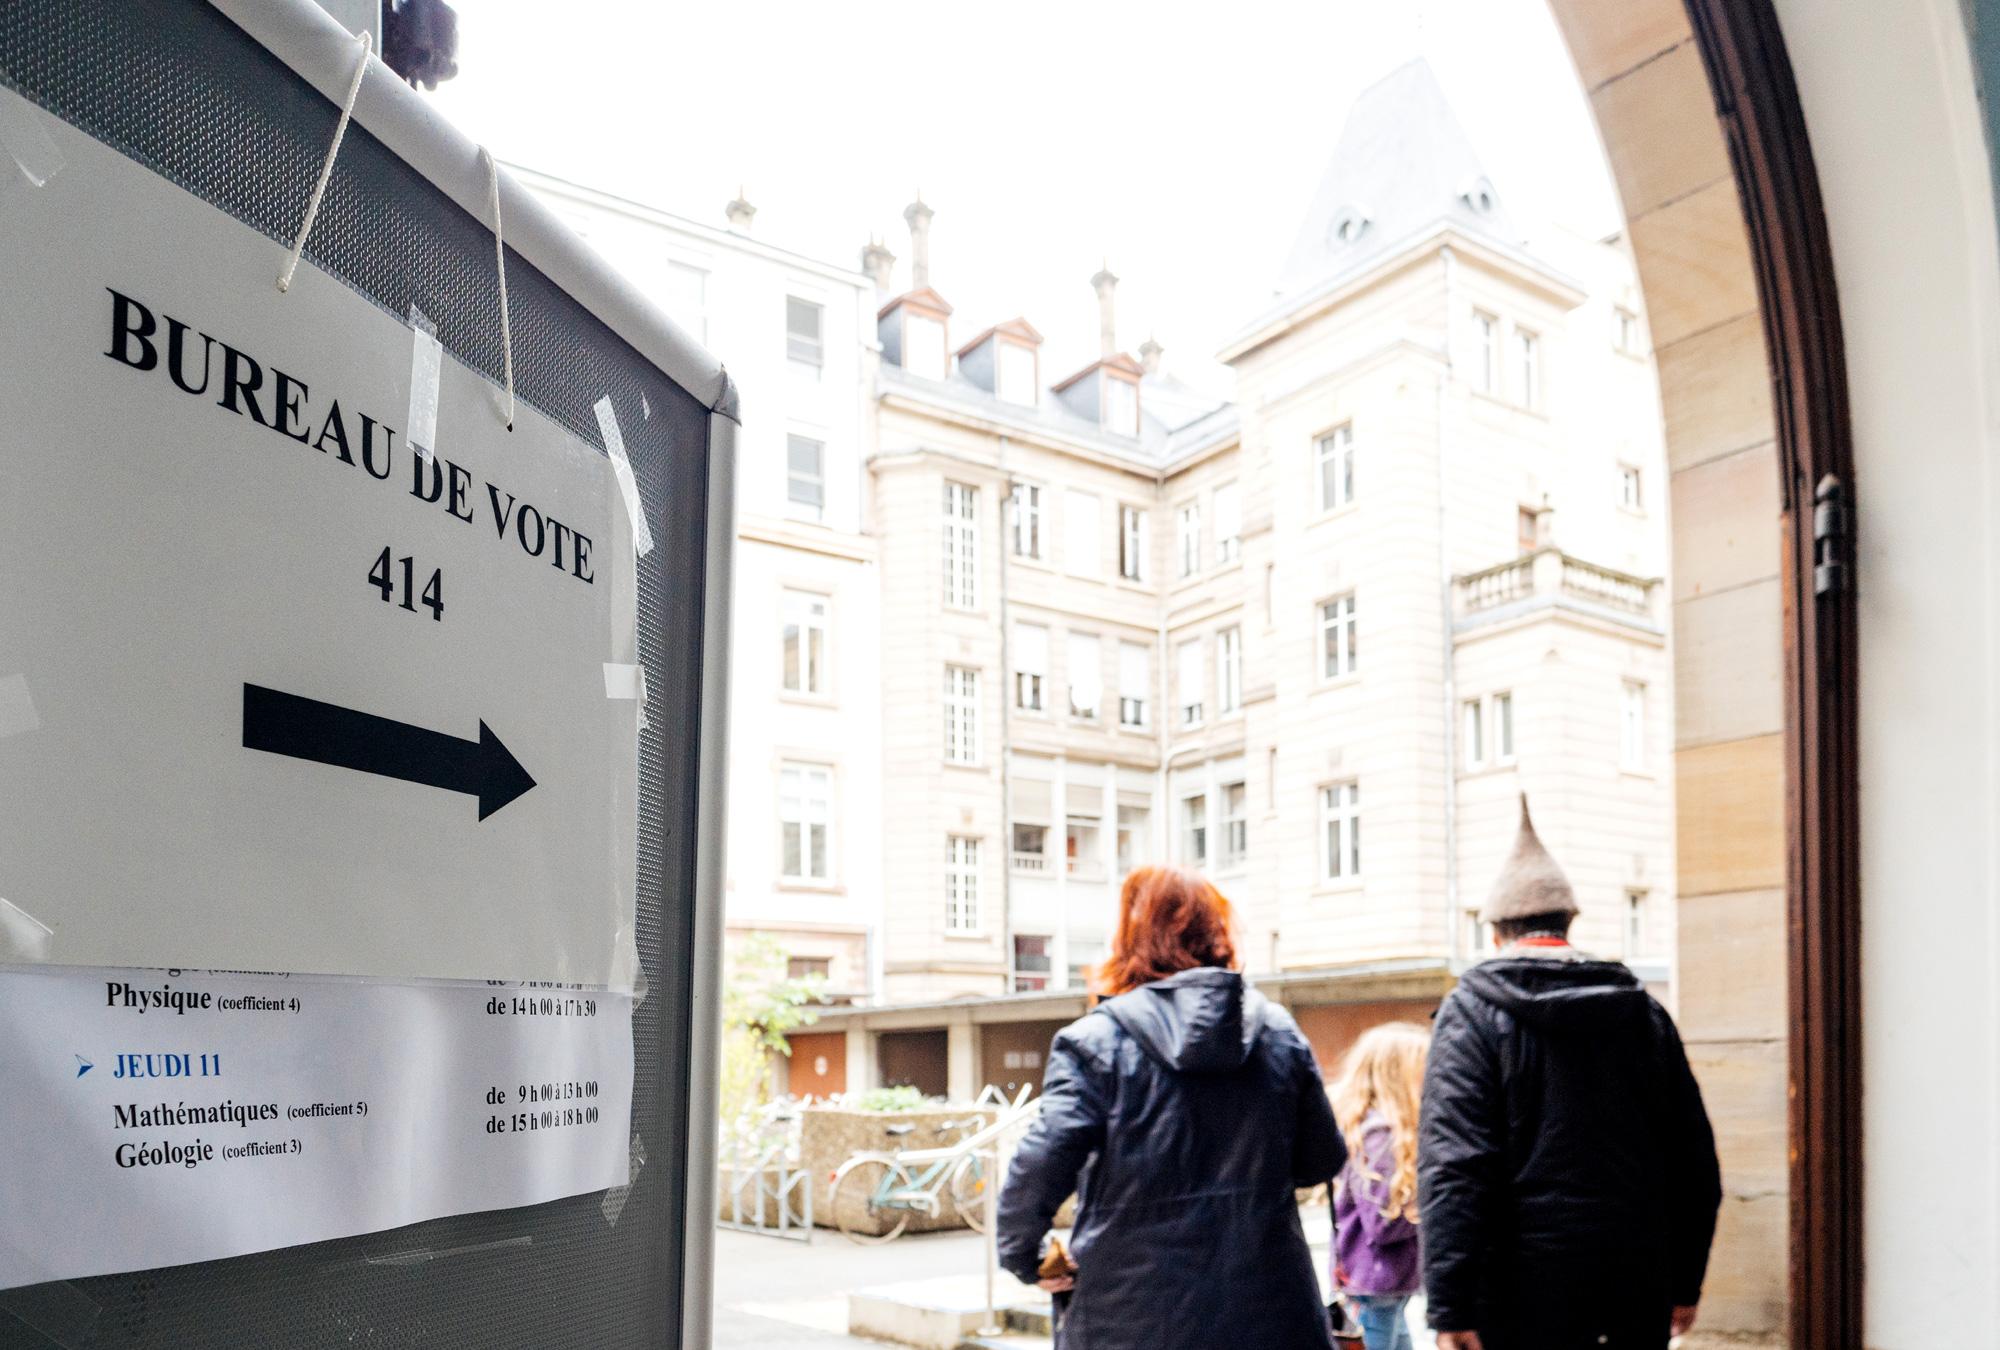 Bureau de vote sign in French